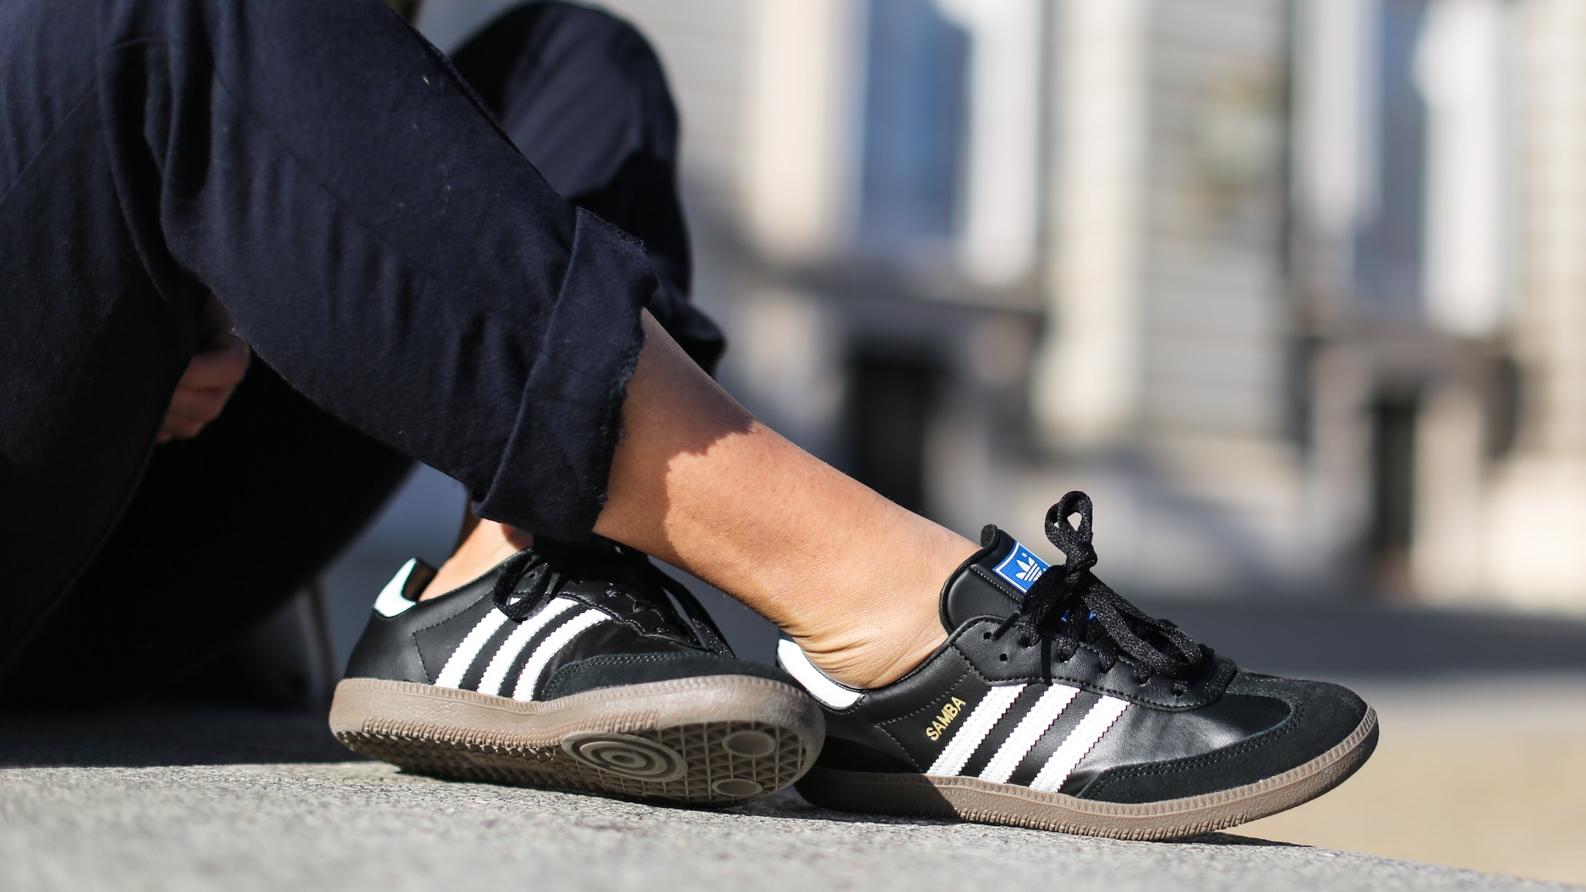 adidas samba for lifting